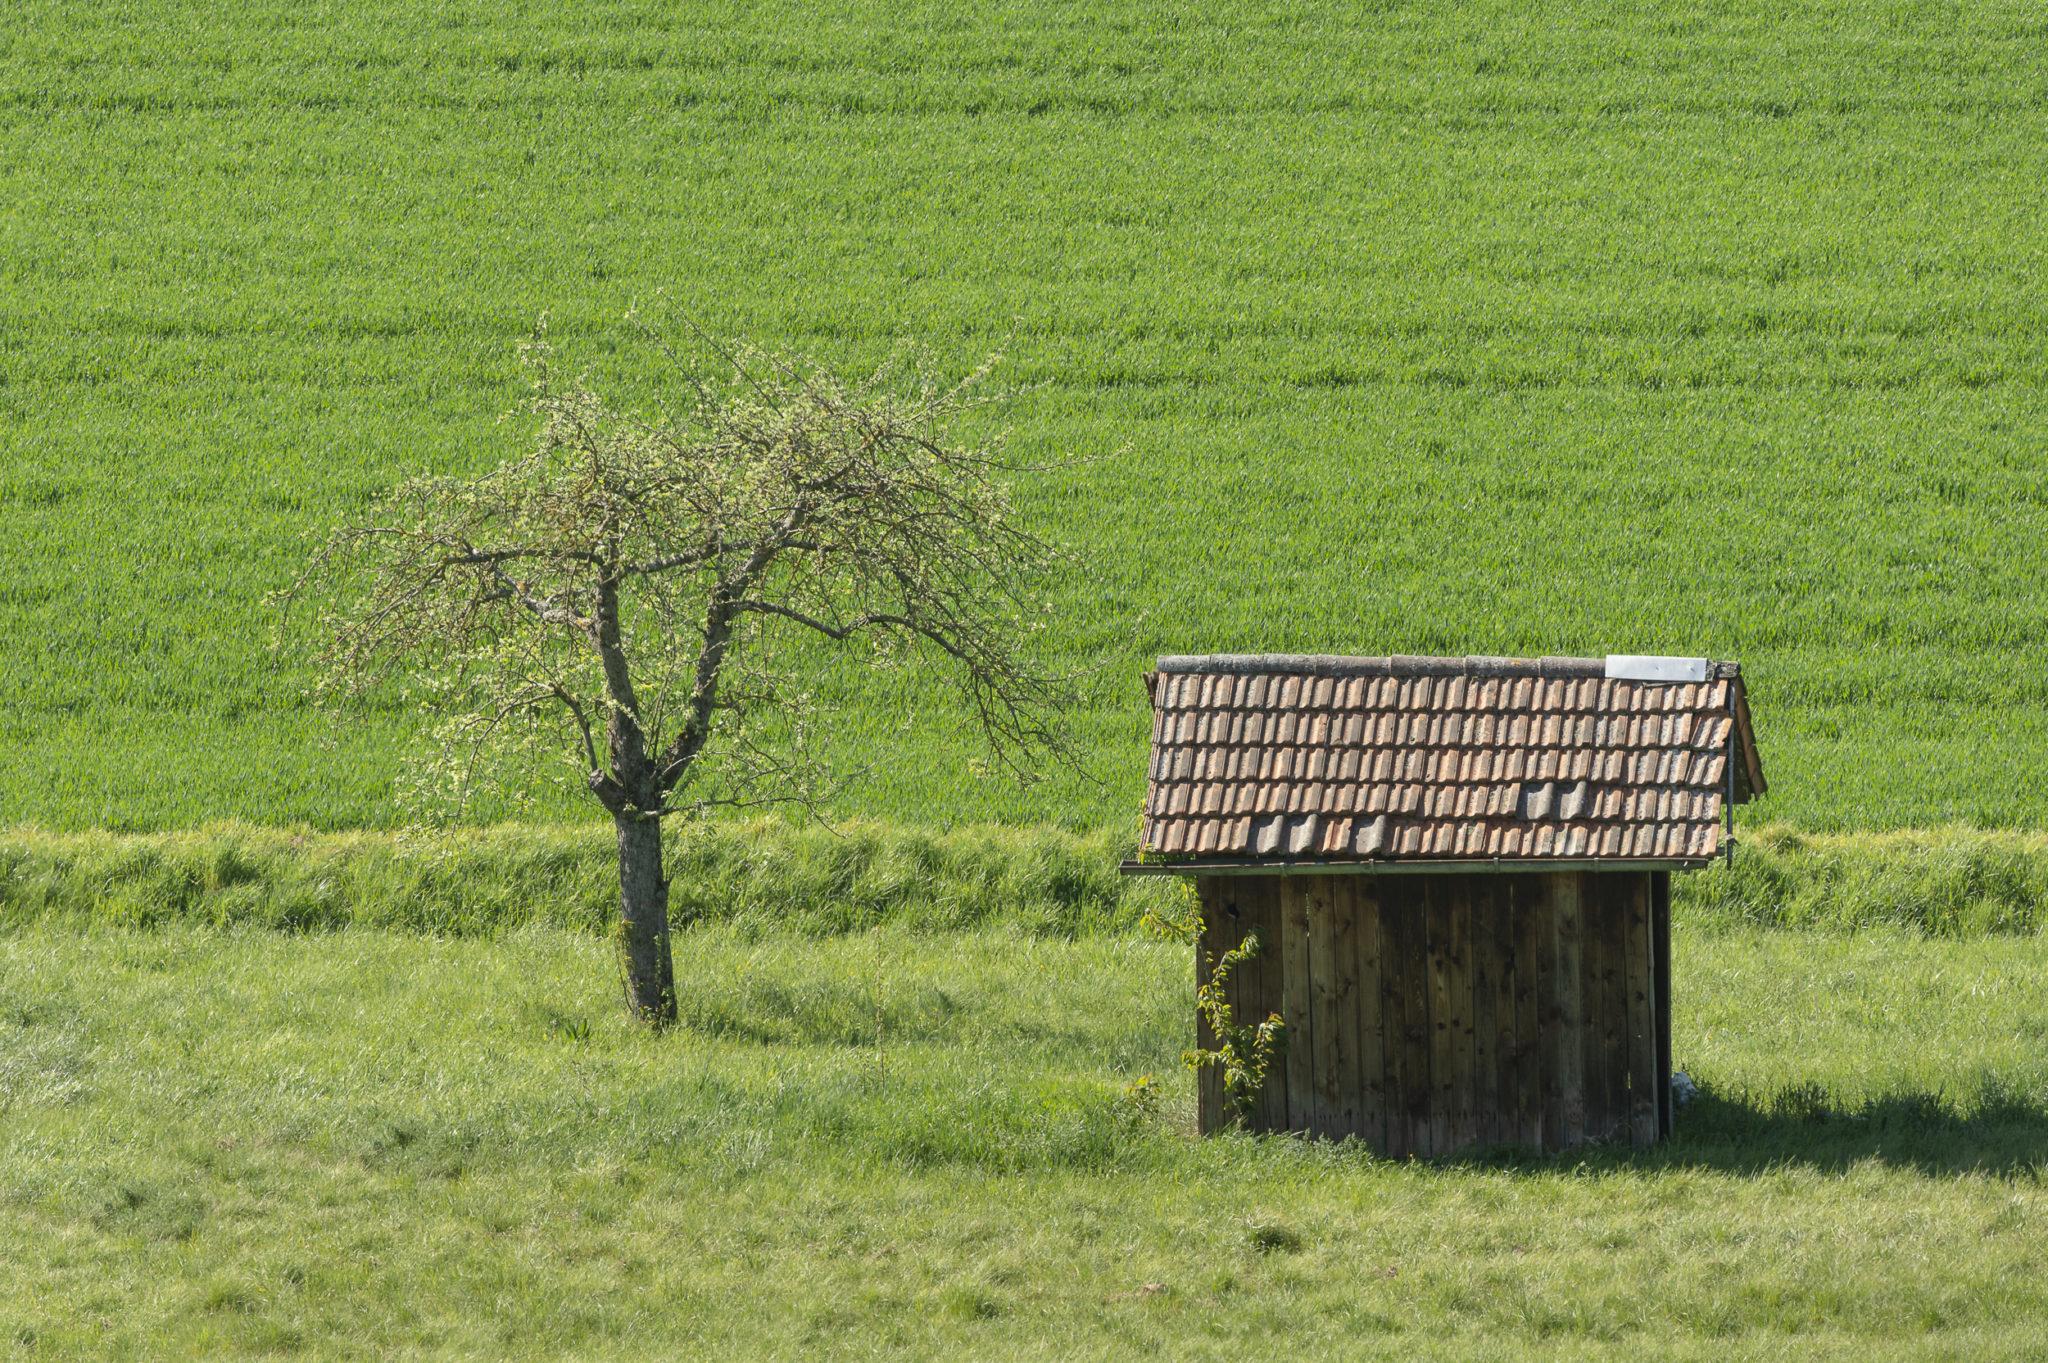 Frühlingsgrün im Kraichgau